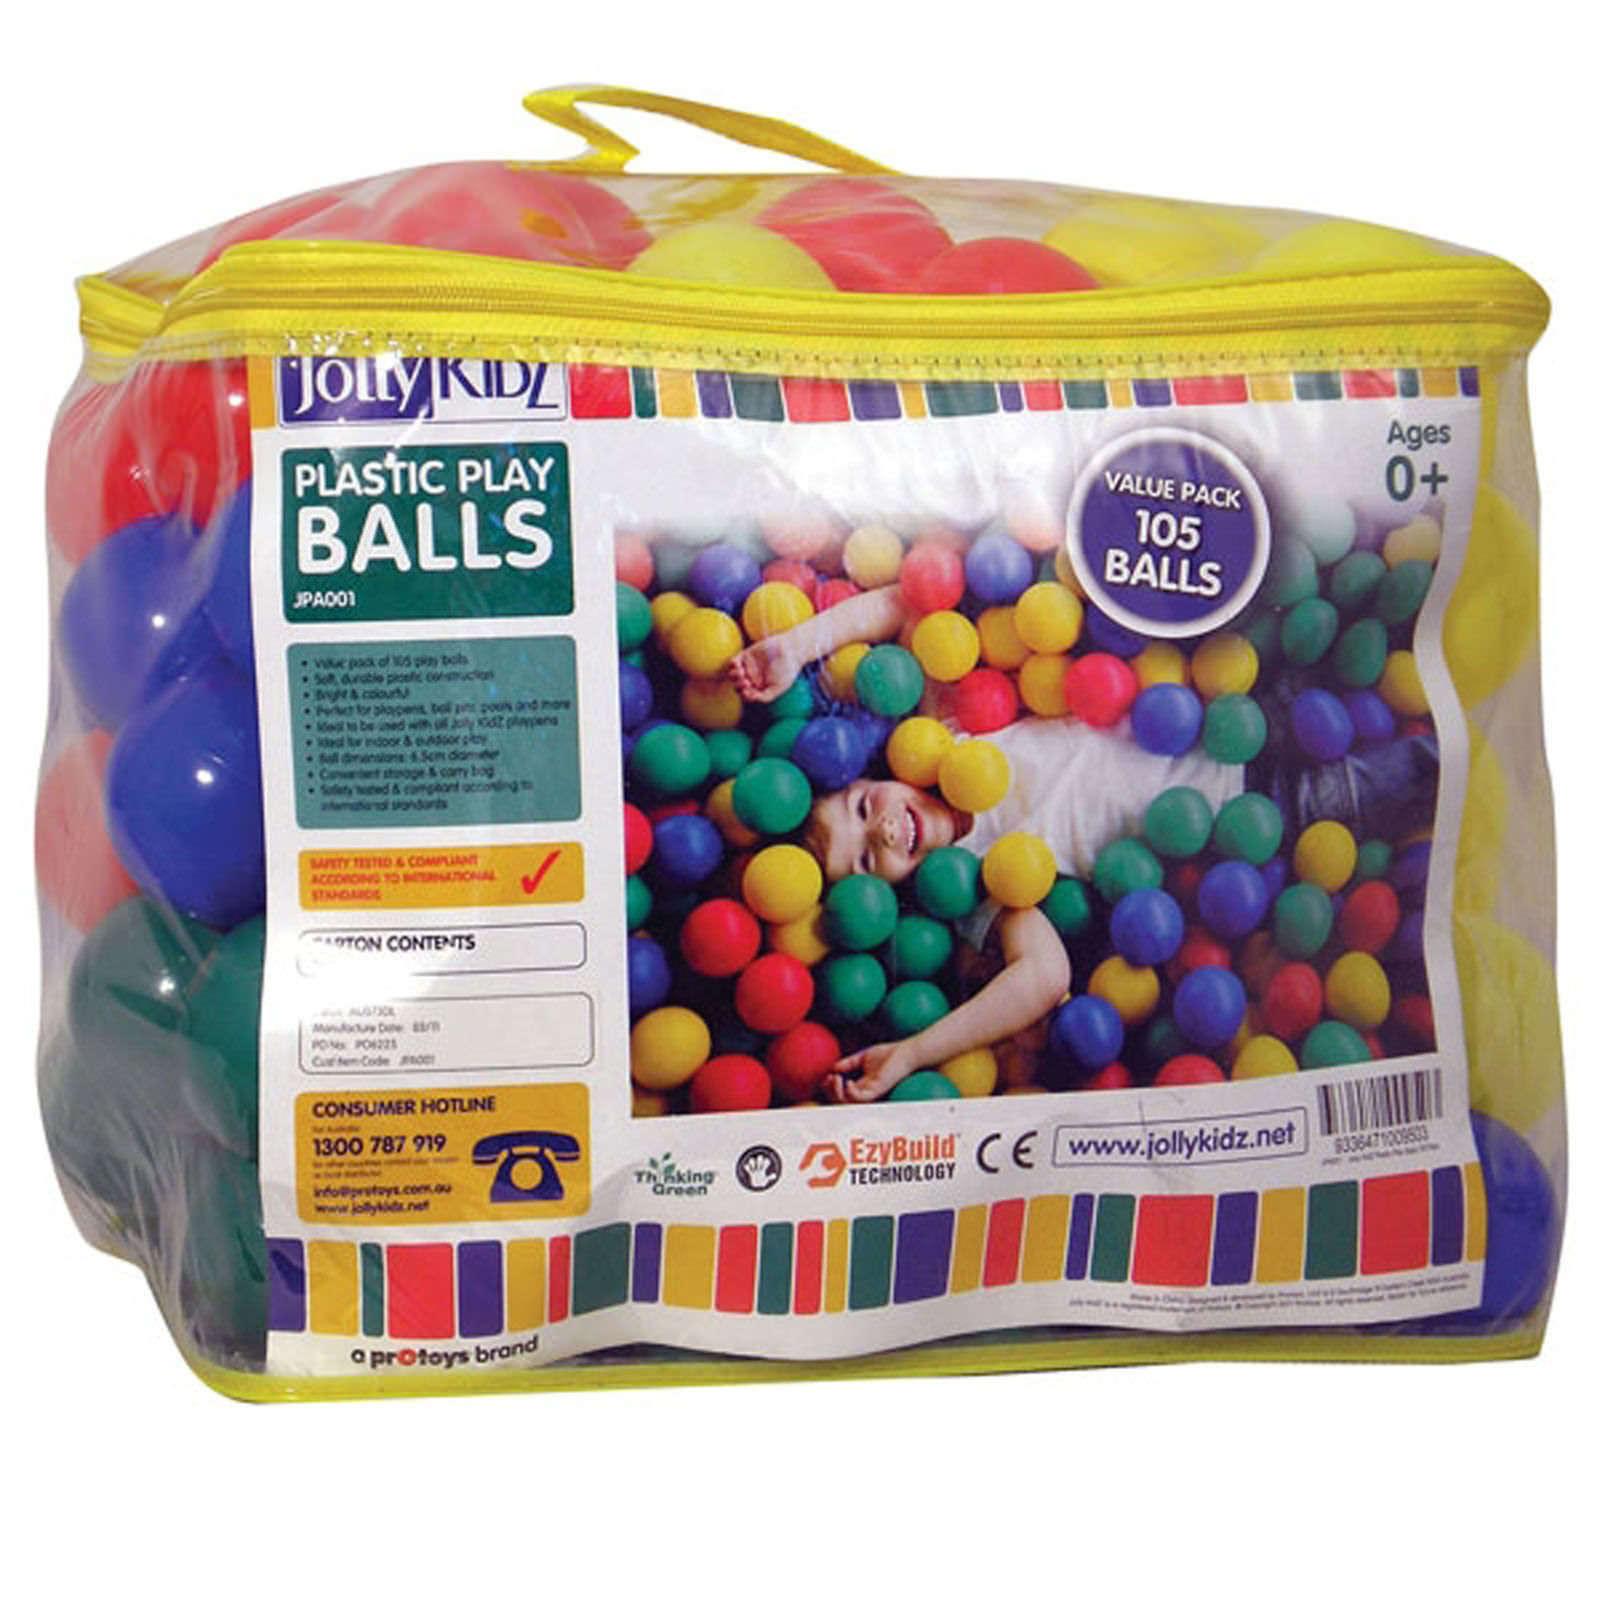 Jolly Kidz Plastic Play Balls